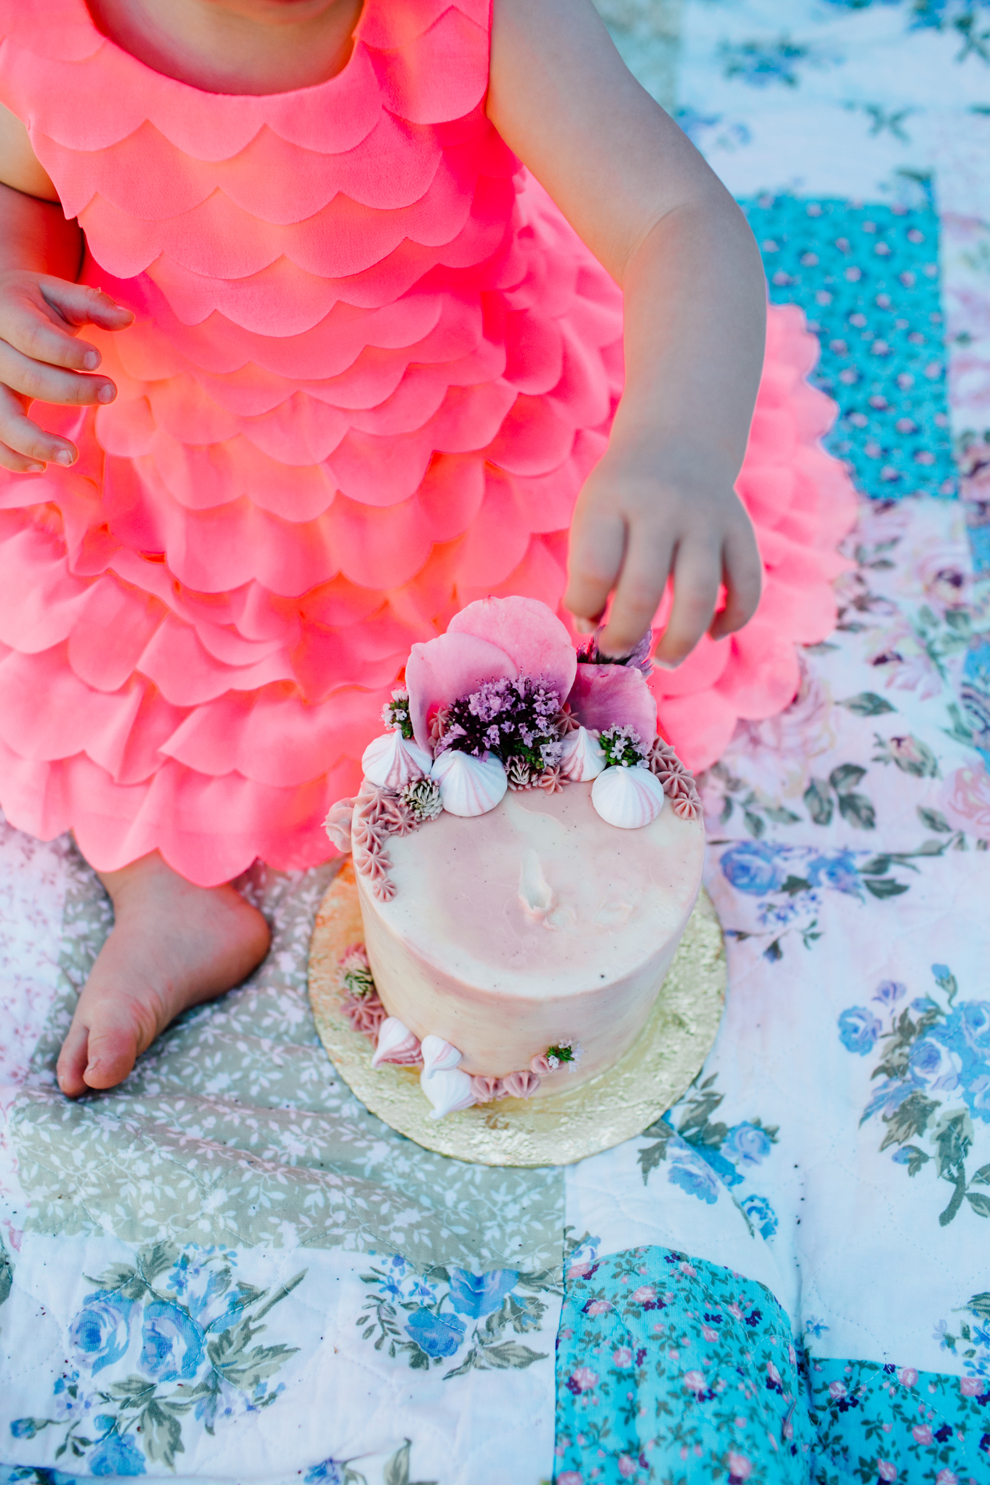 010-bellingham-one-year-birthday-cake-smash-katheryn-moran-romy.jpg